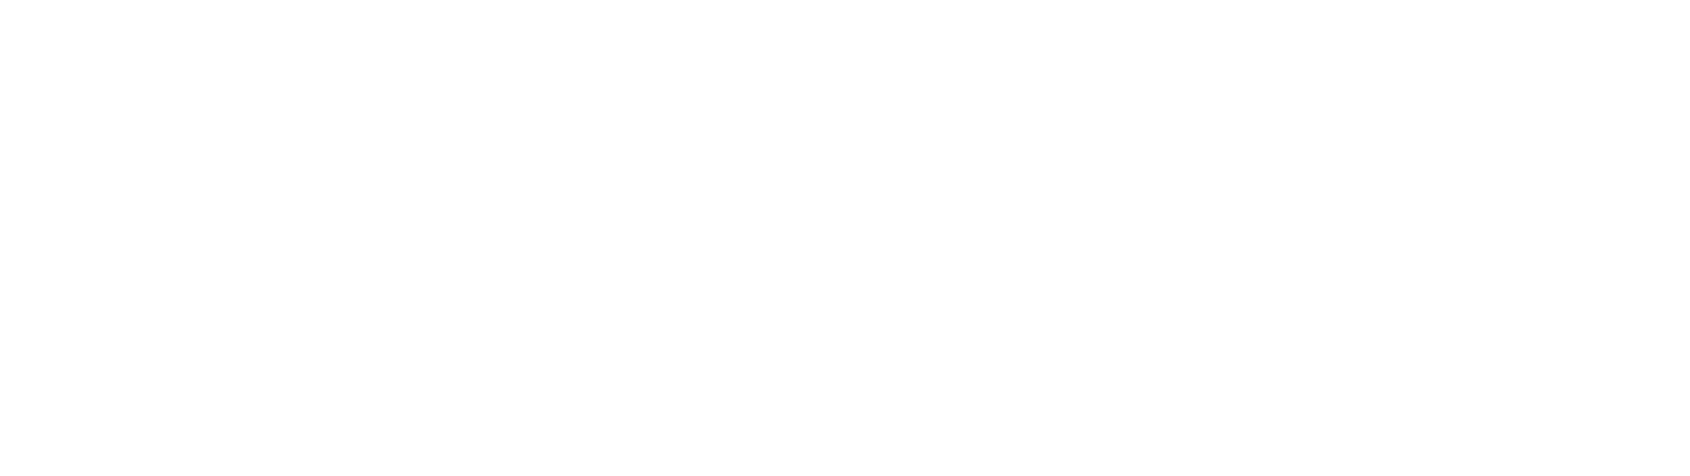 ccim2021 logo